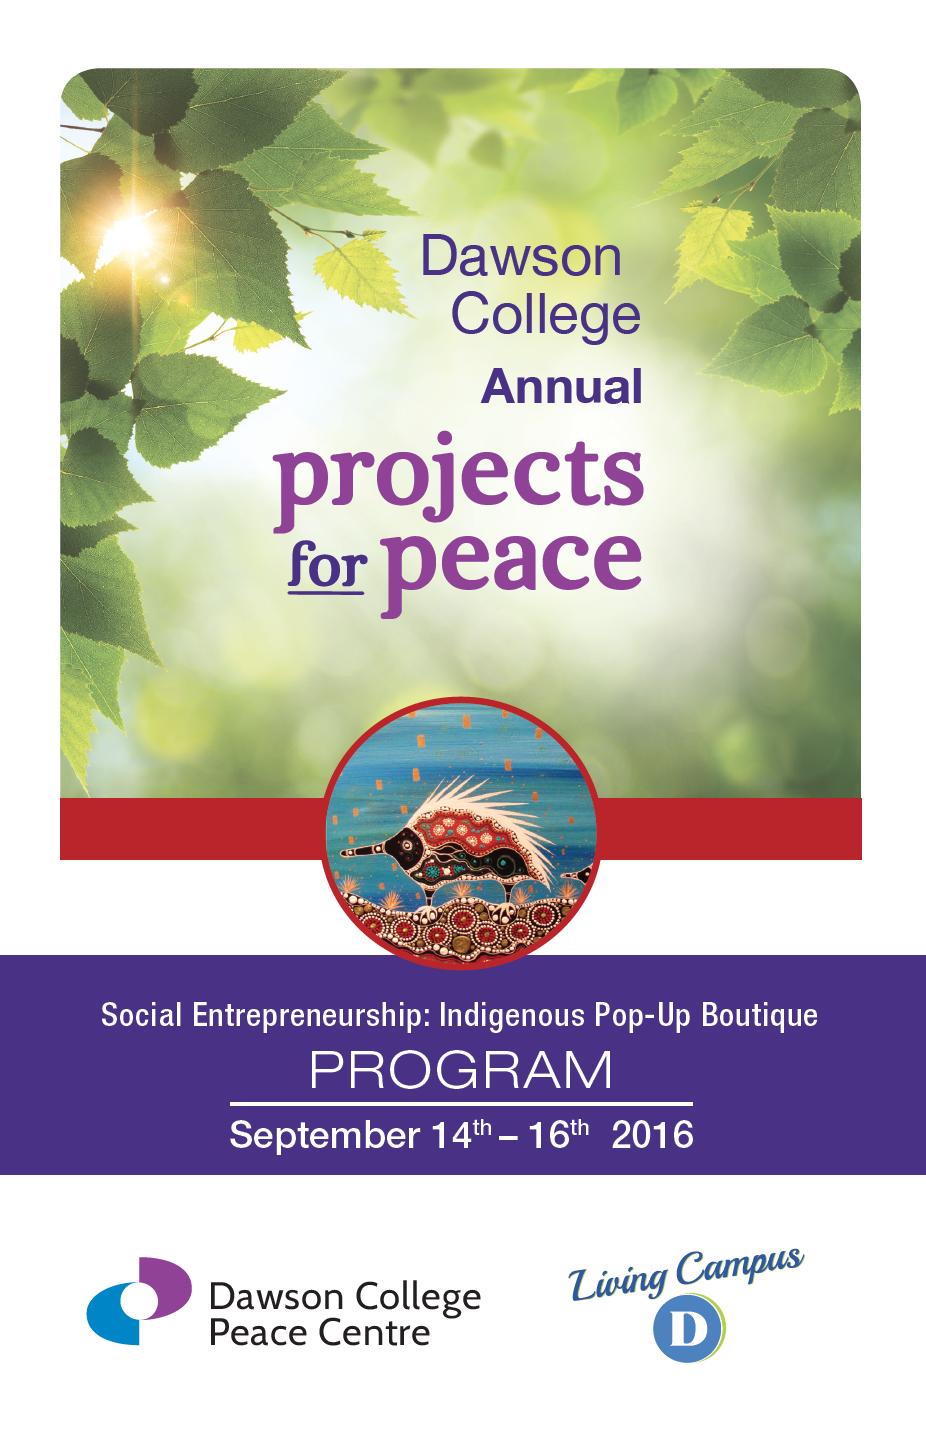 Program for Symposium